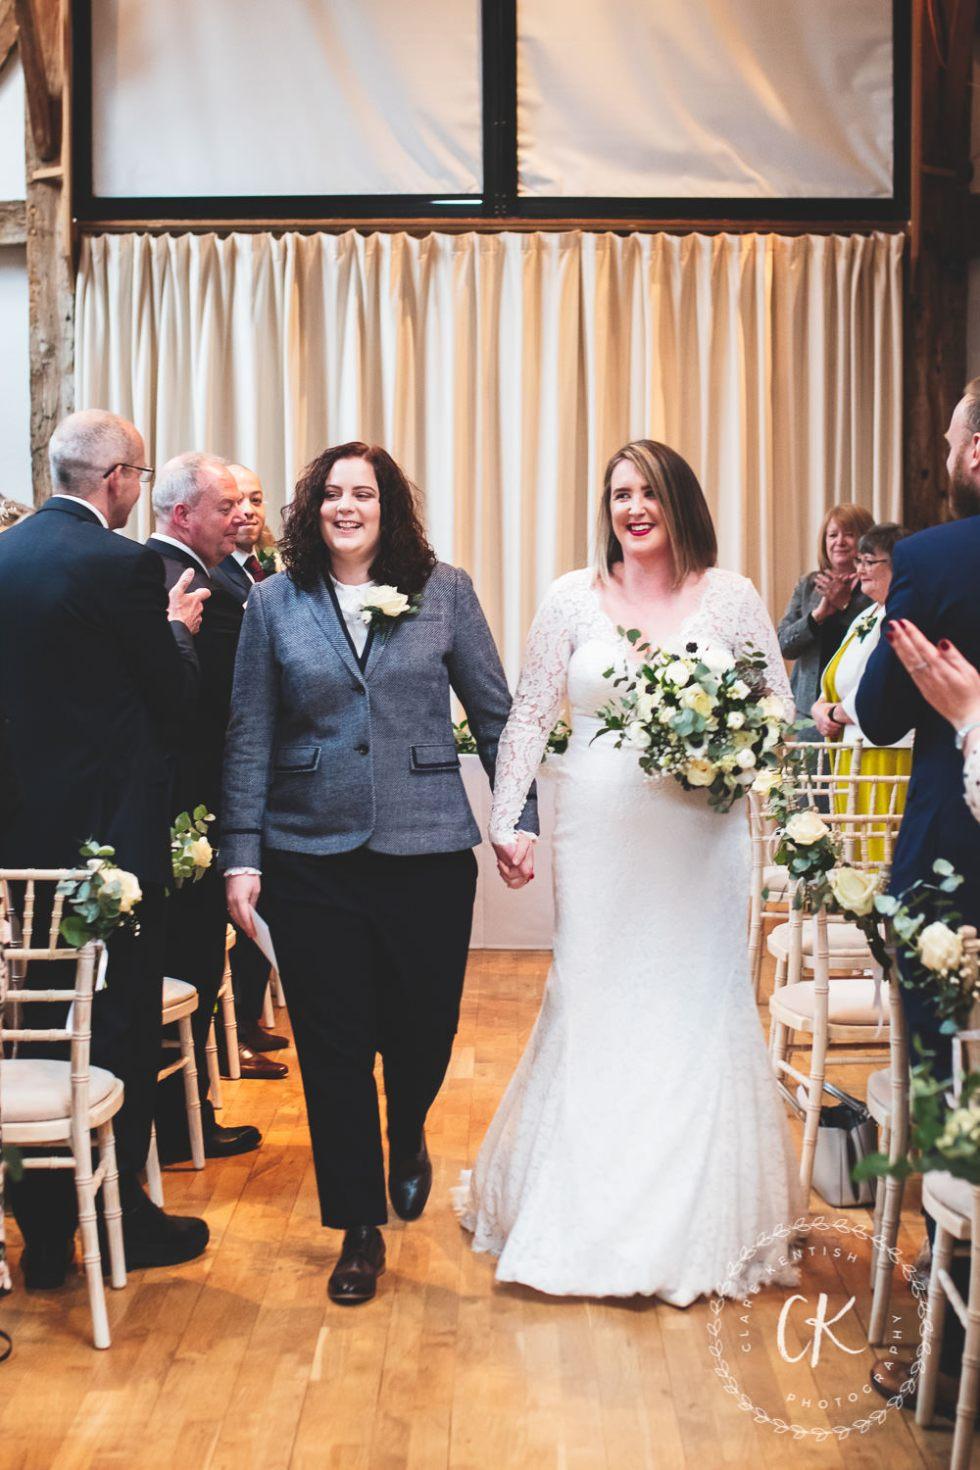 CCsp-Henry-Moore-Wedding-Brickendon-Grange-Herts-Hertfordshire_0002